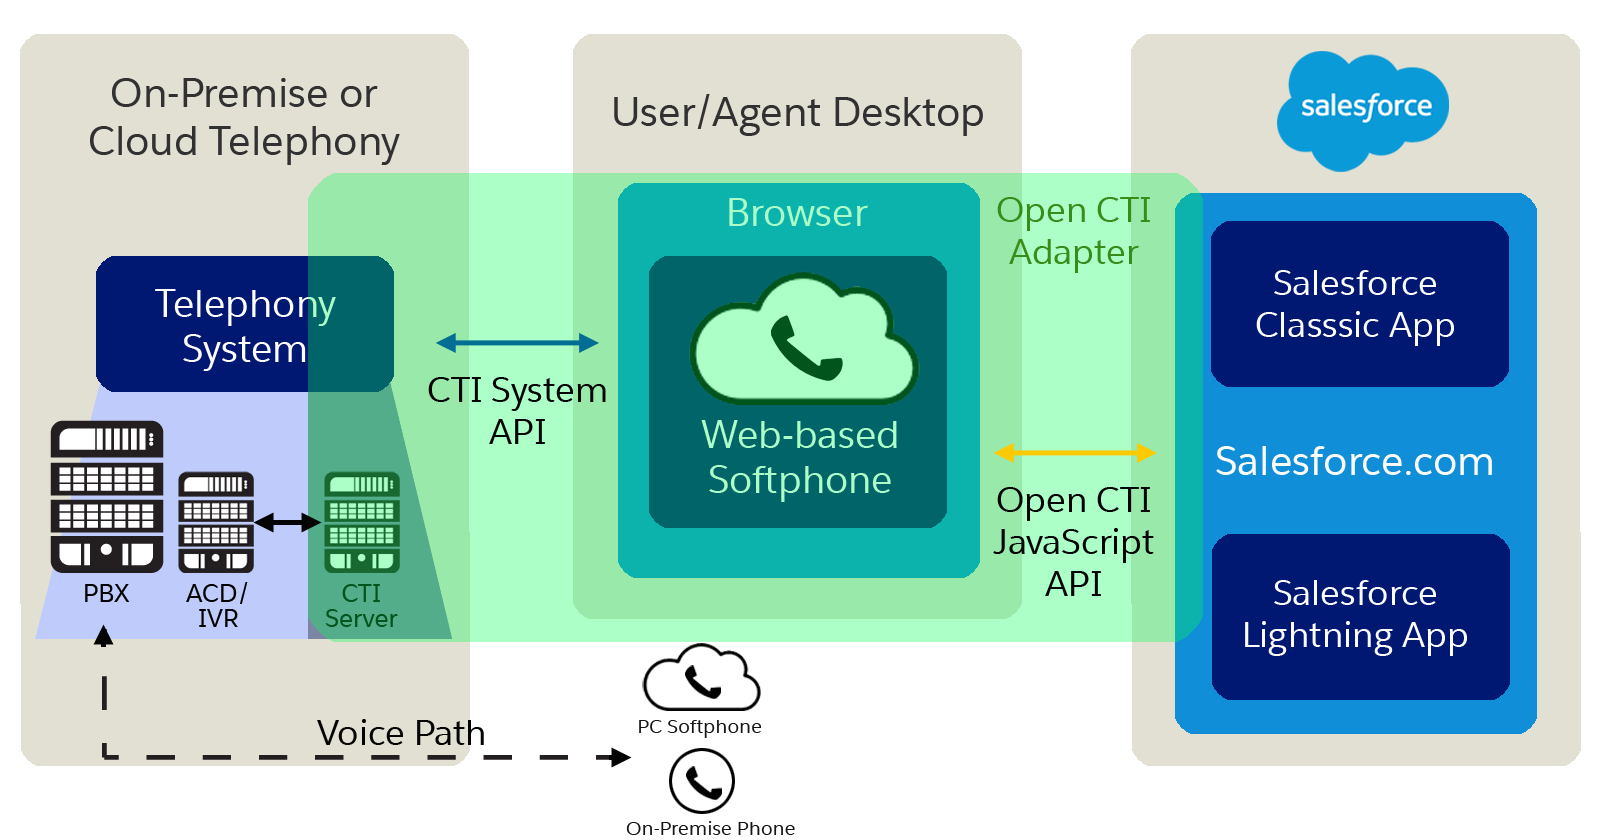 salesforce open cti rh help salesforce com salesforce cti developer guide pdf Open CTI Salesforce